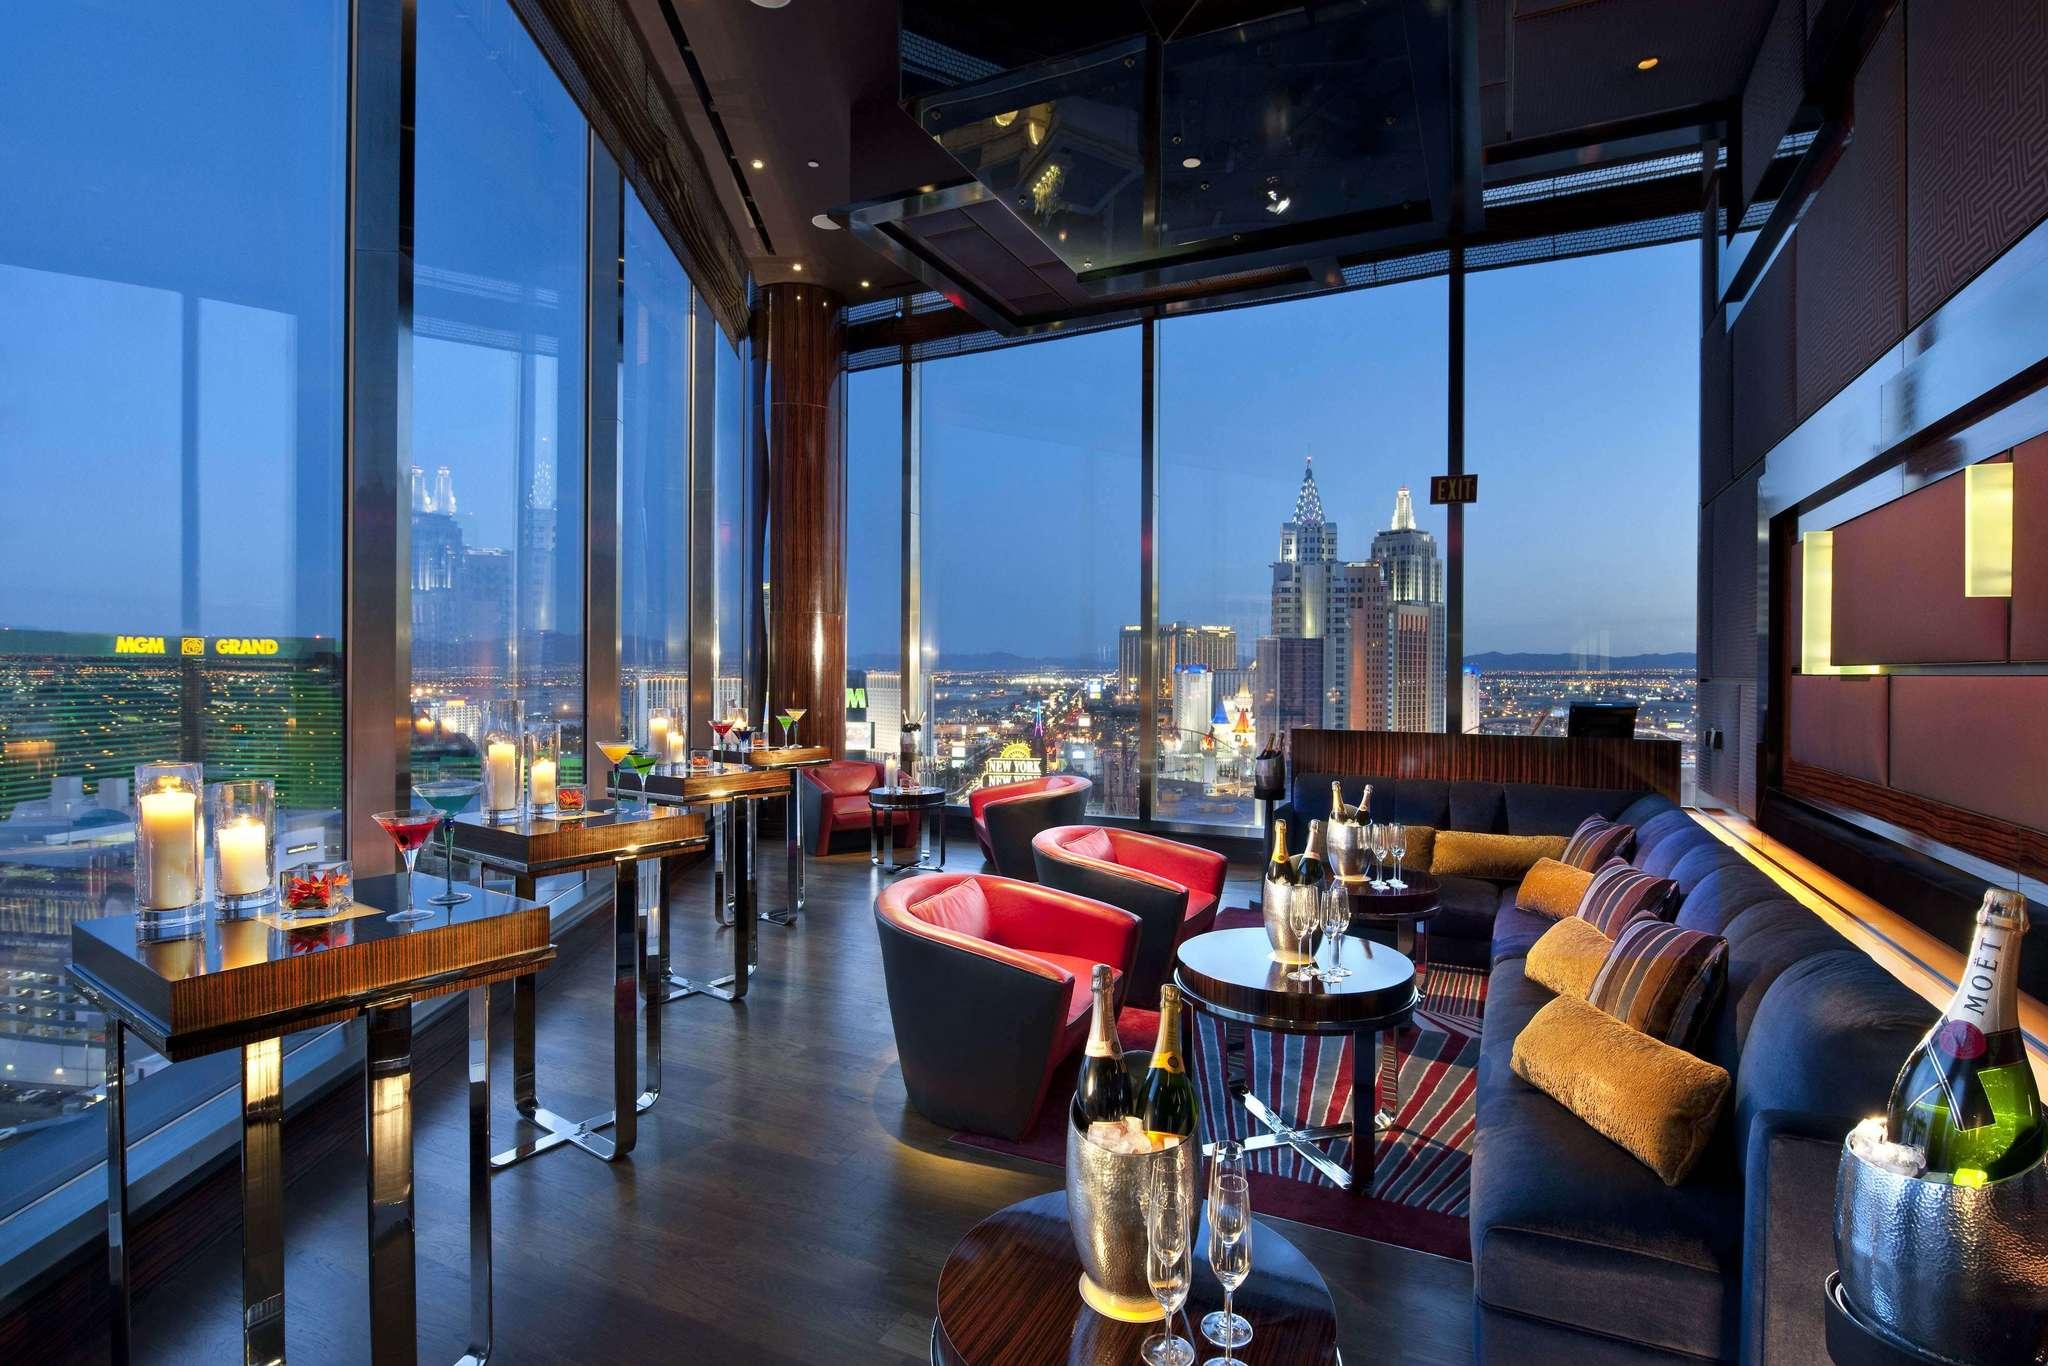 las-vegas-restaurant-mandarin-bar-city-views